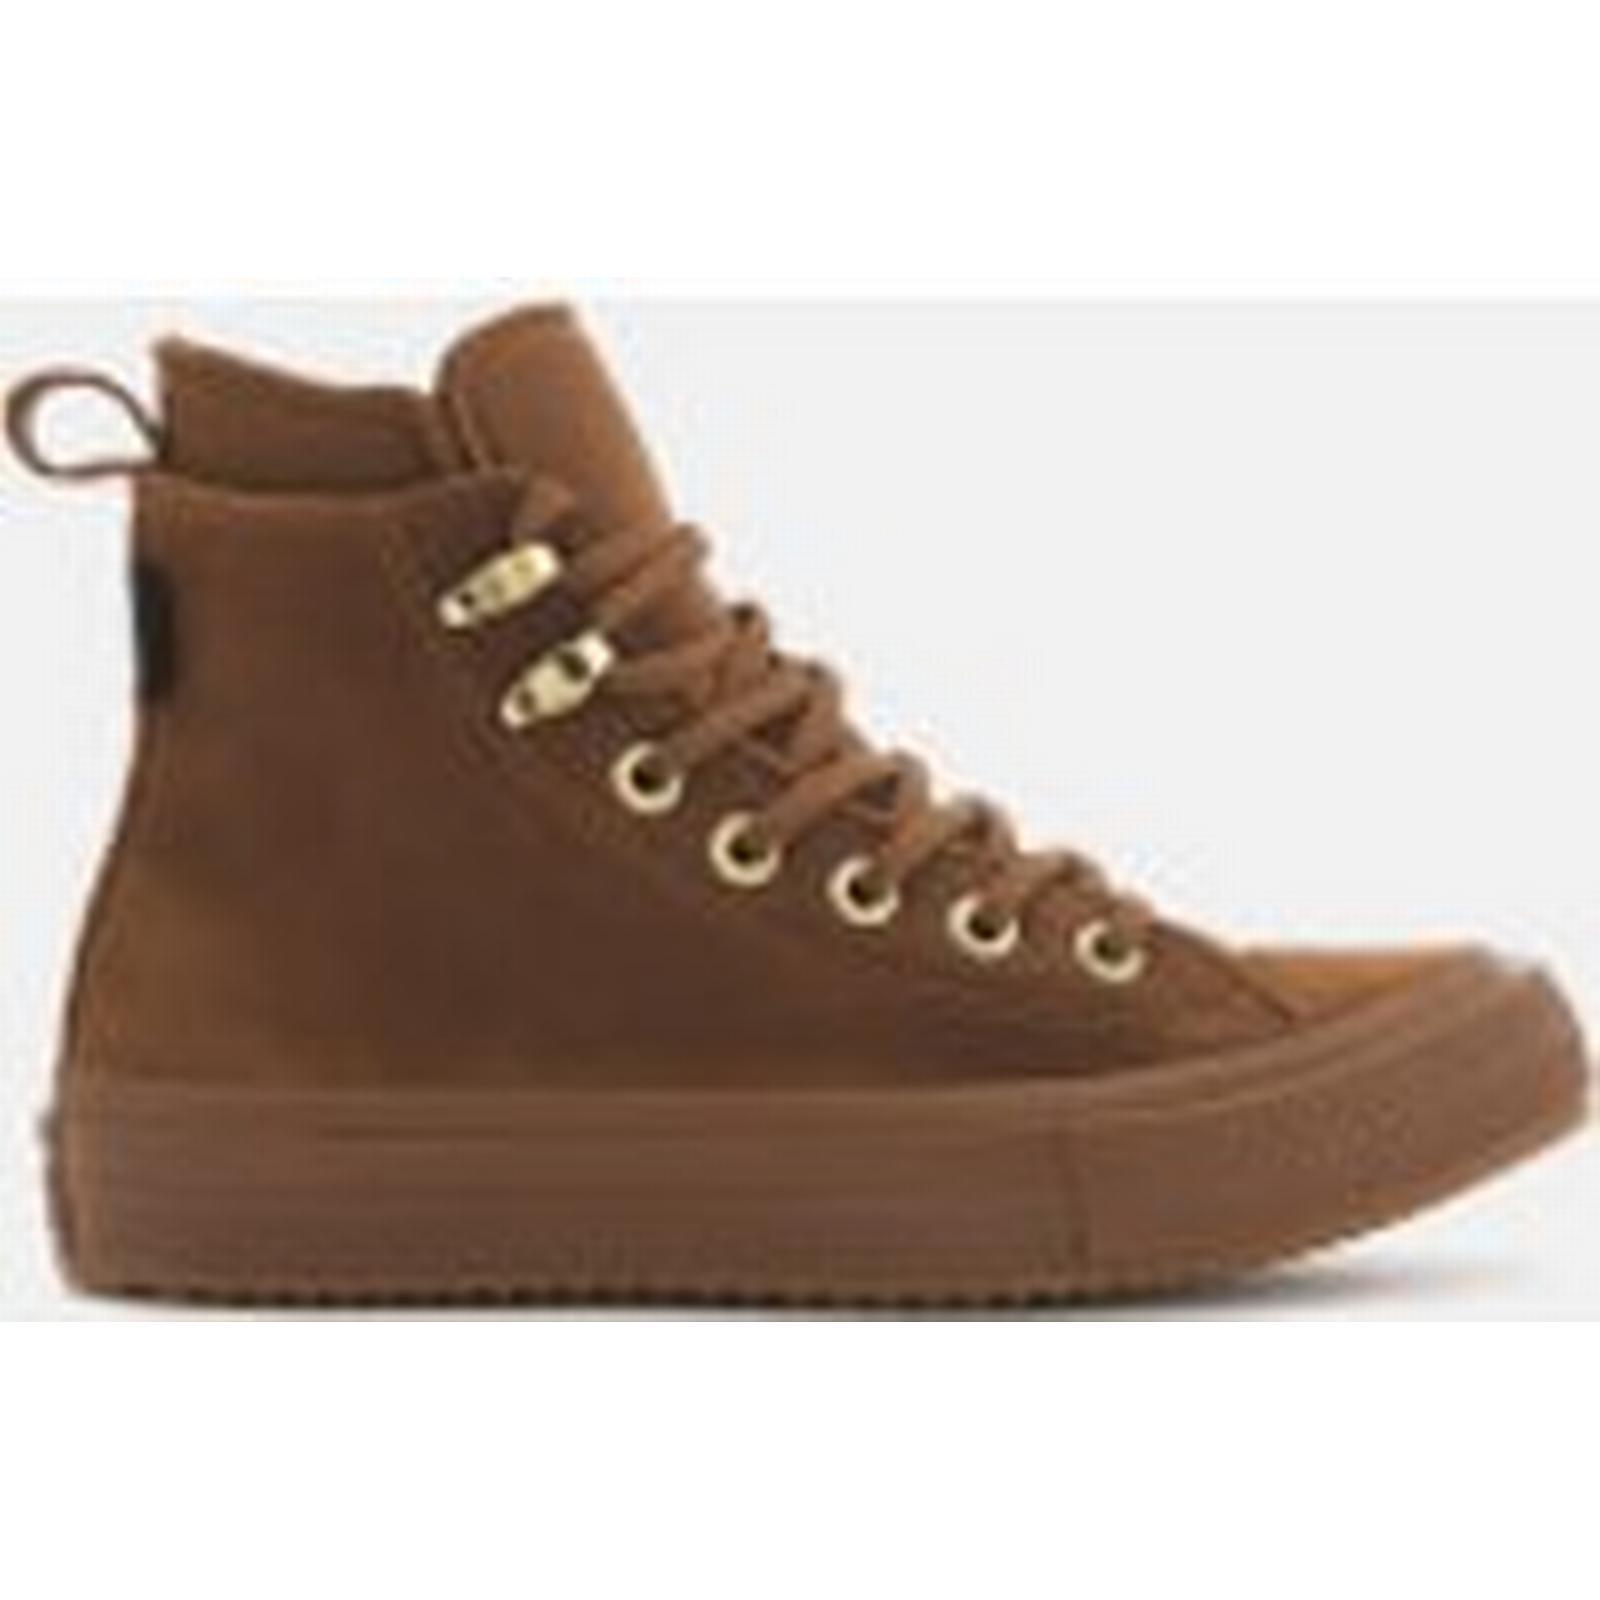 Converse Women's Chuck Taylor All Brown/Brown/Brass Star Waterproof Boots - Brown/Brown/Brass All a7f693